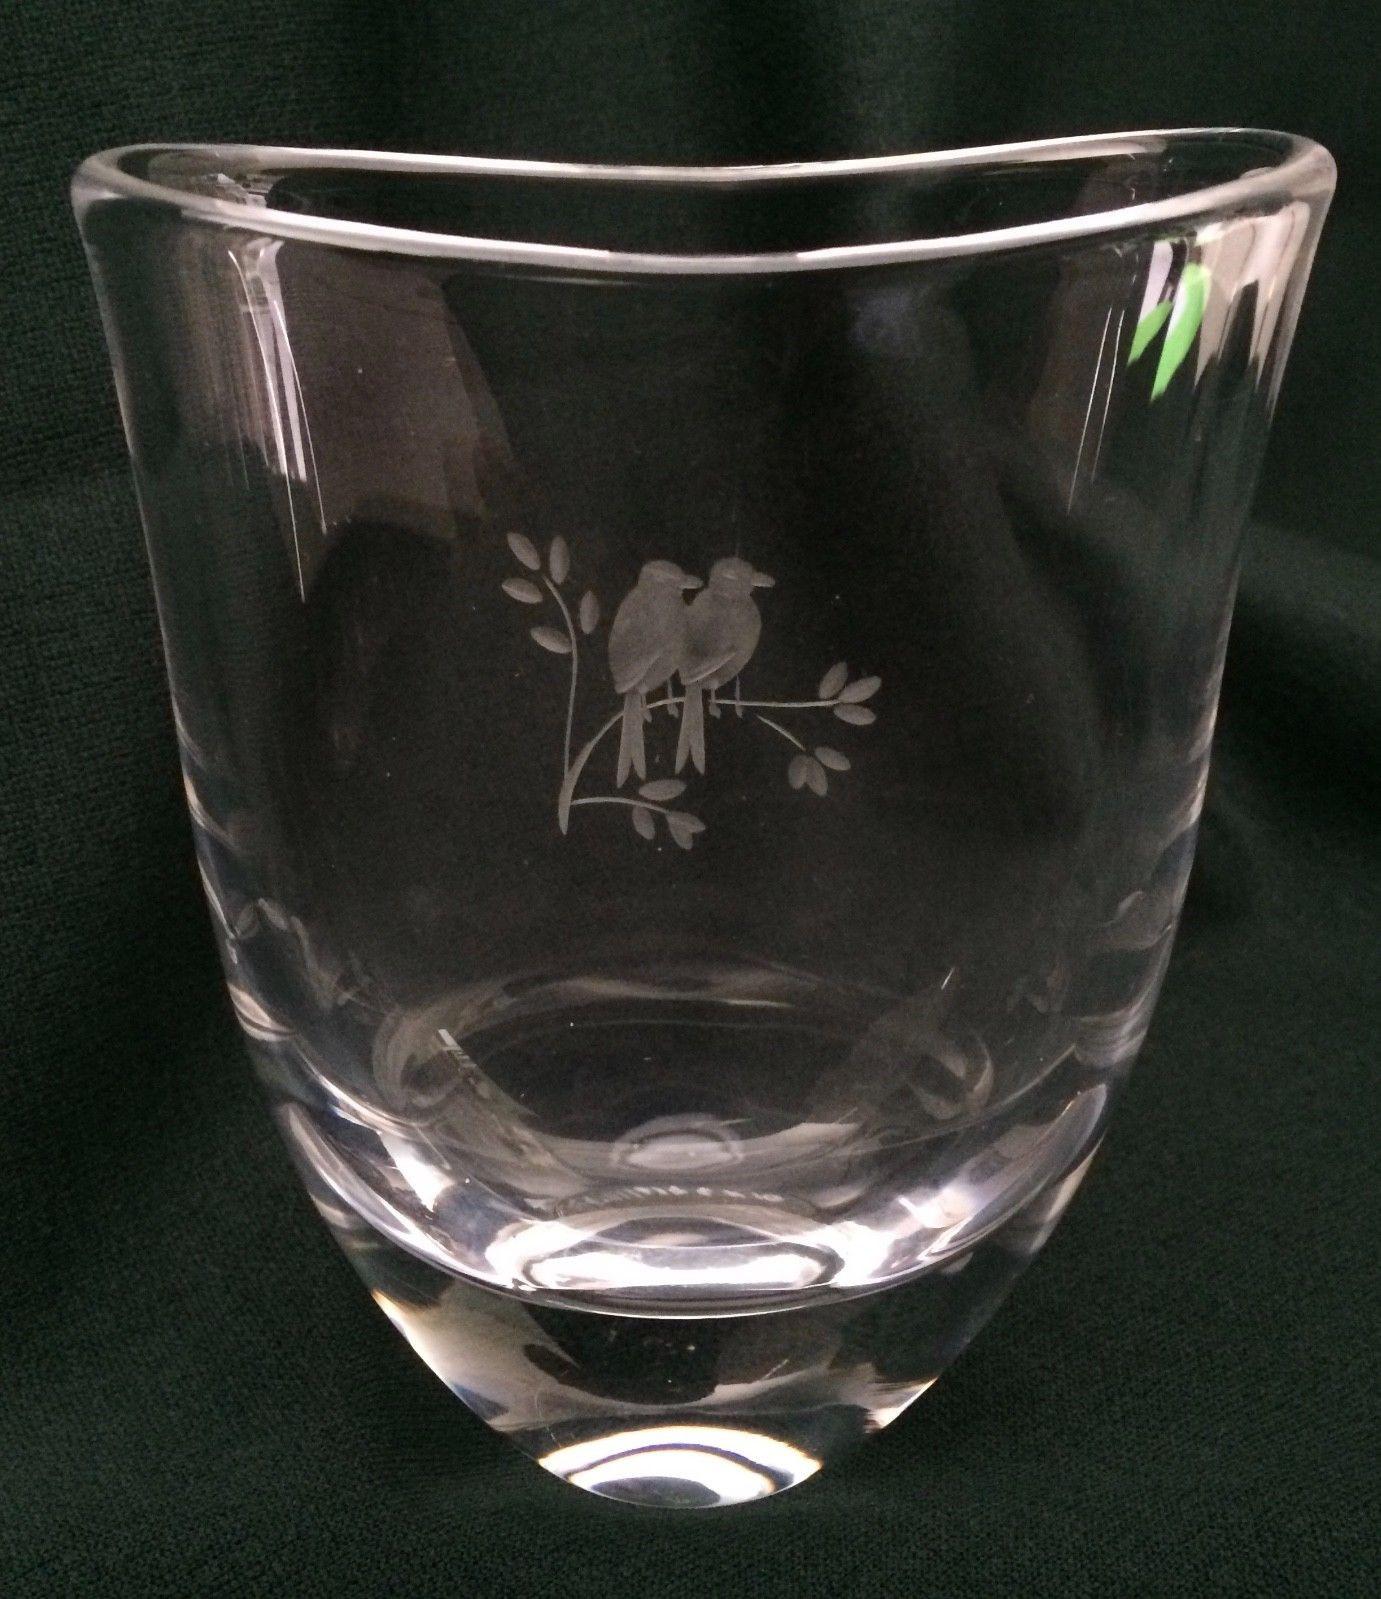 orrefors vase vintage of vintage orrefors small crystal vase with etched love birds signed for 1 of 3 see more